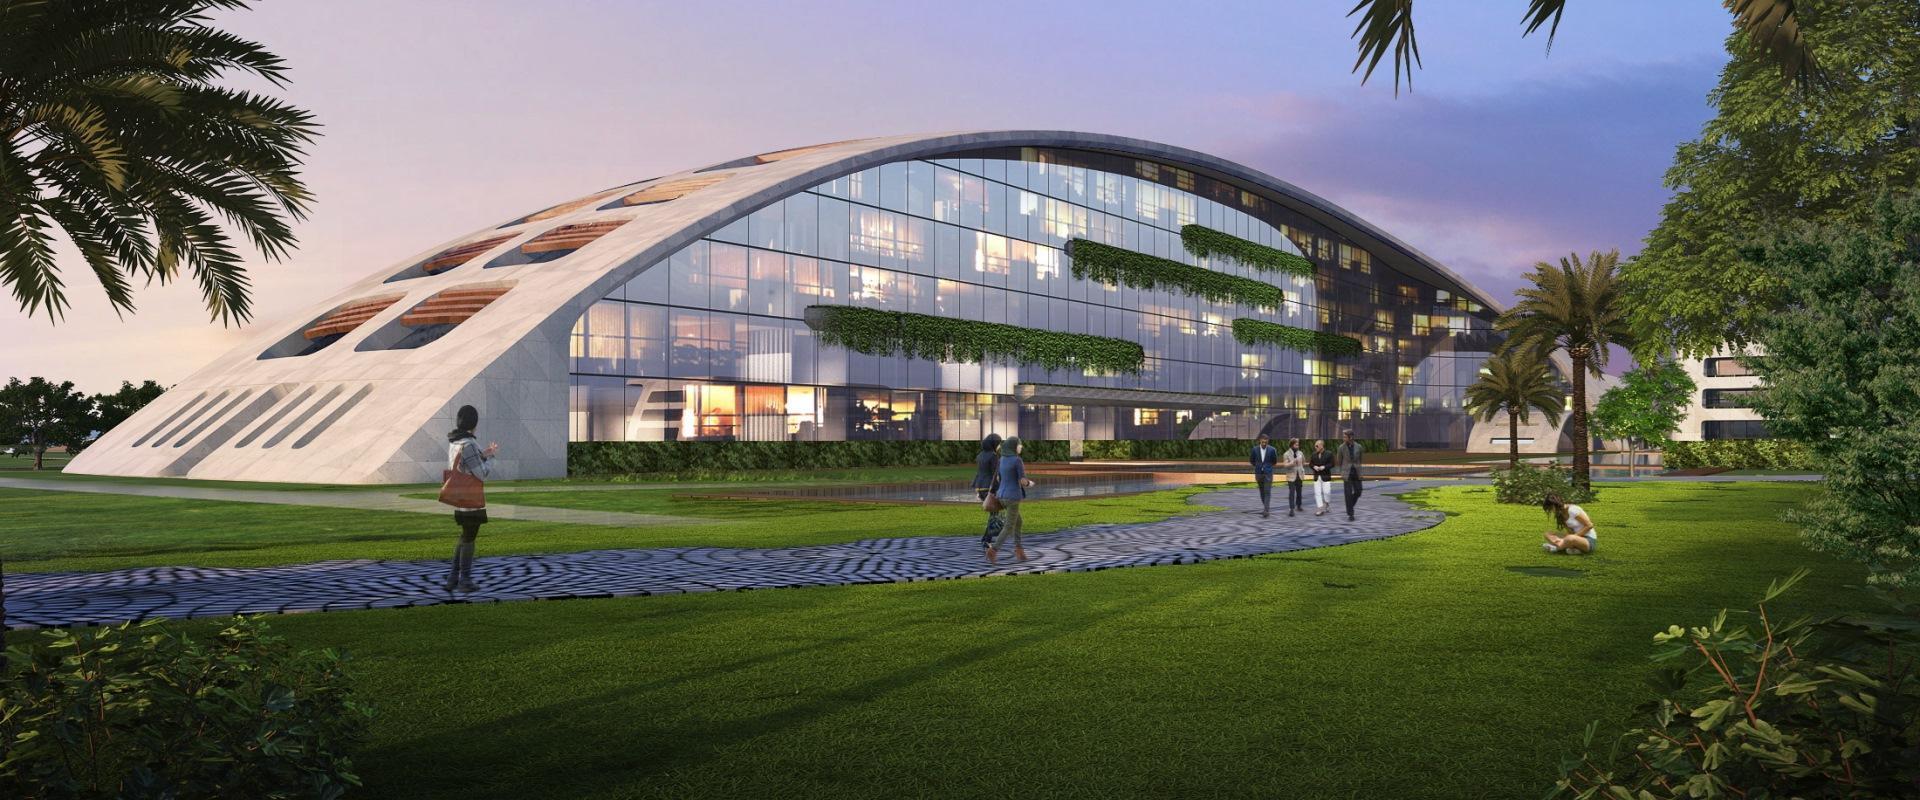 Dusit Thani Laguna Singapore: Staycation Approved